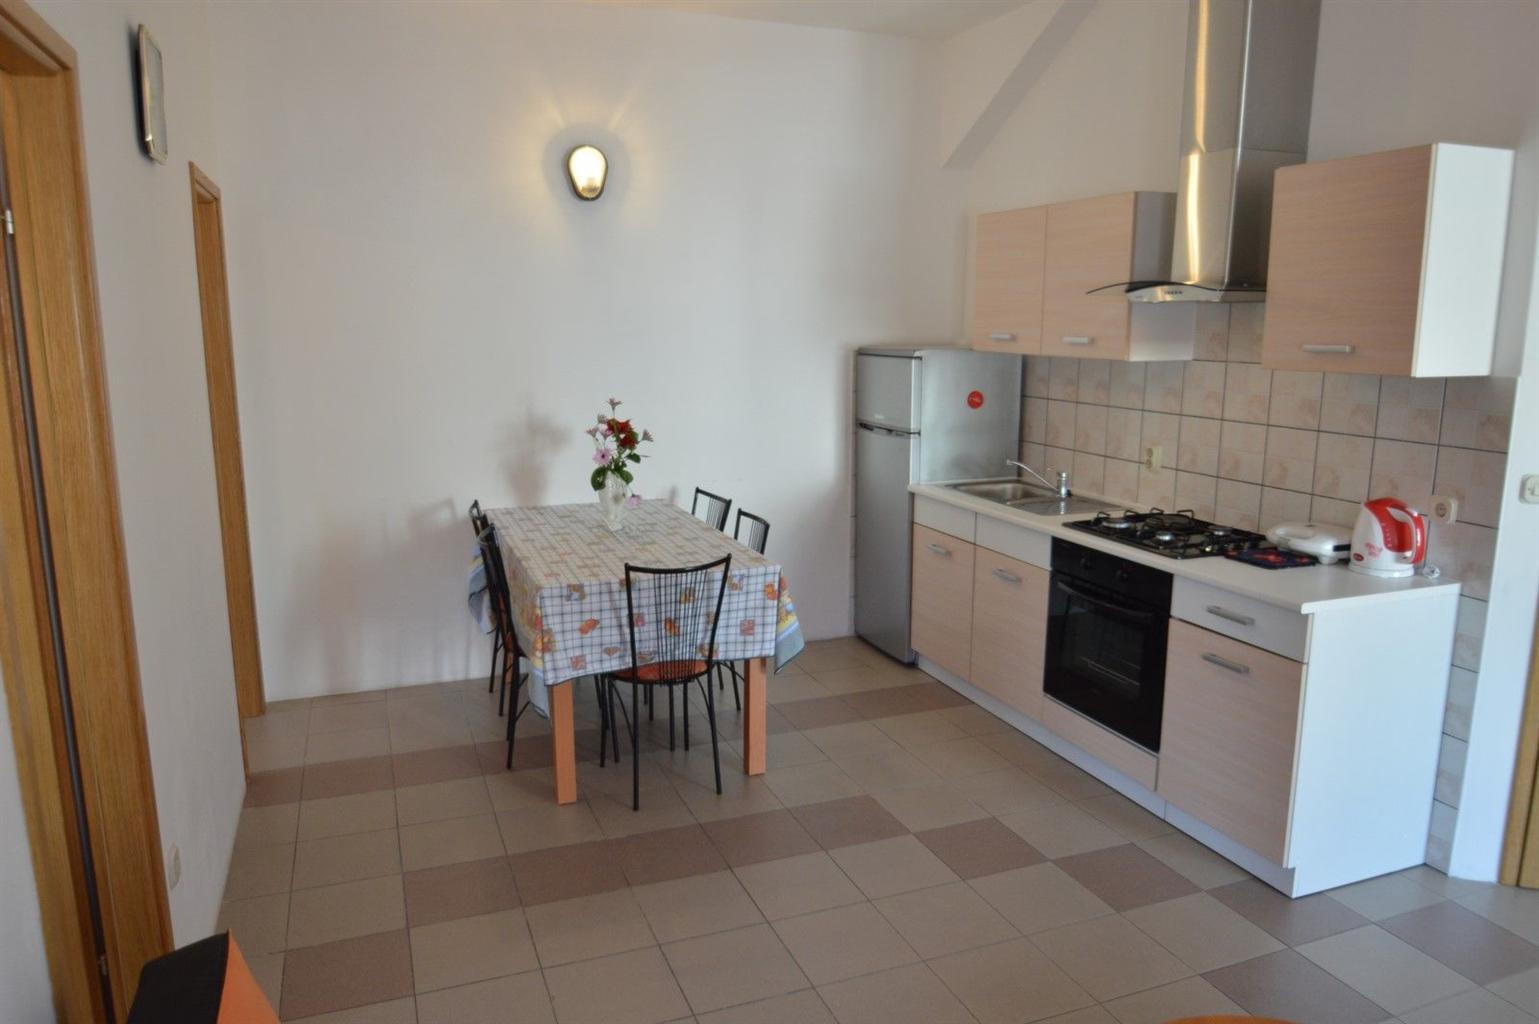 Ferienwohnung Ferienwohnungen GOGA 23531-A3 (2021392), Mali Lošinj, Insel Losinj, Kvarner, Kroatien, Bild 10